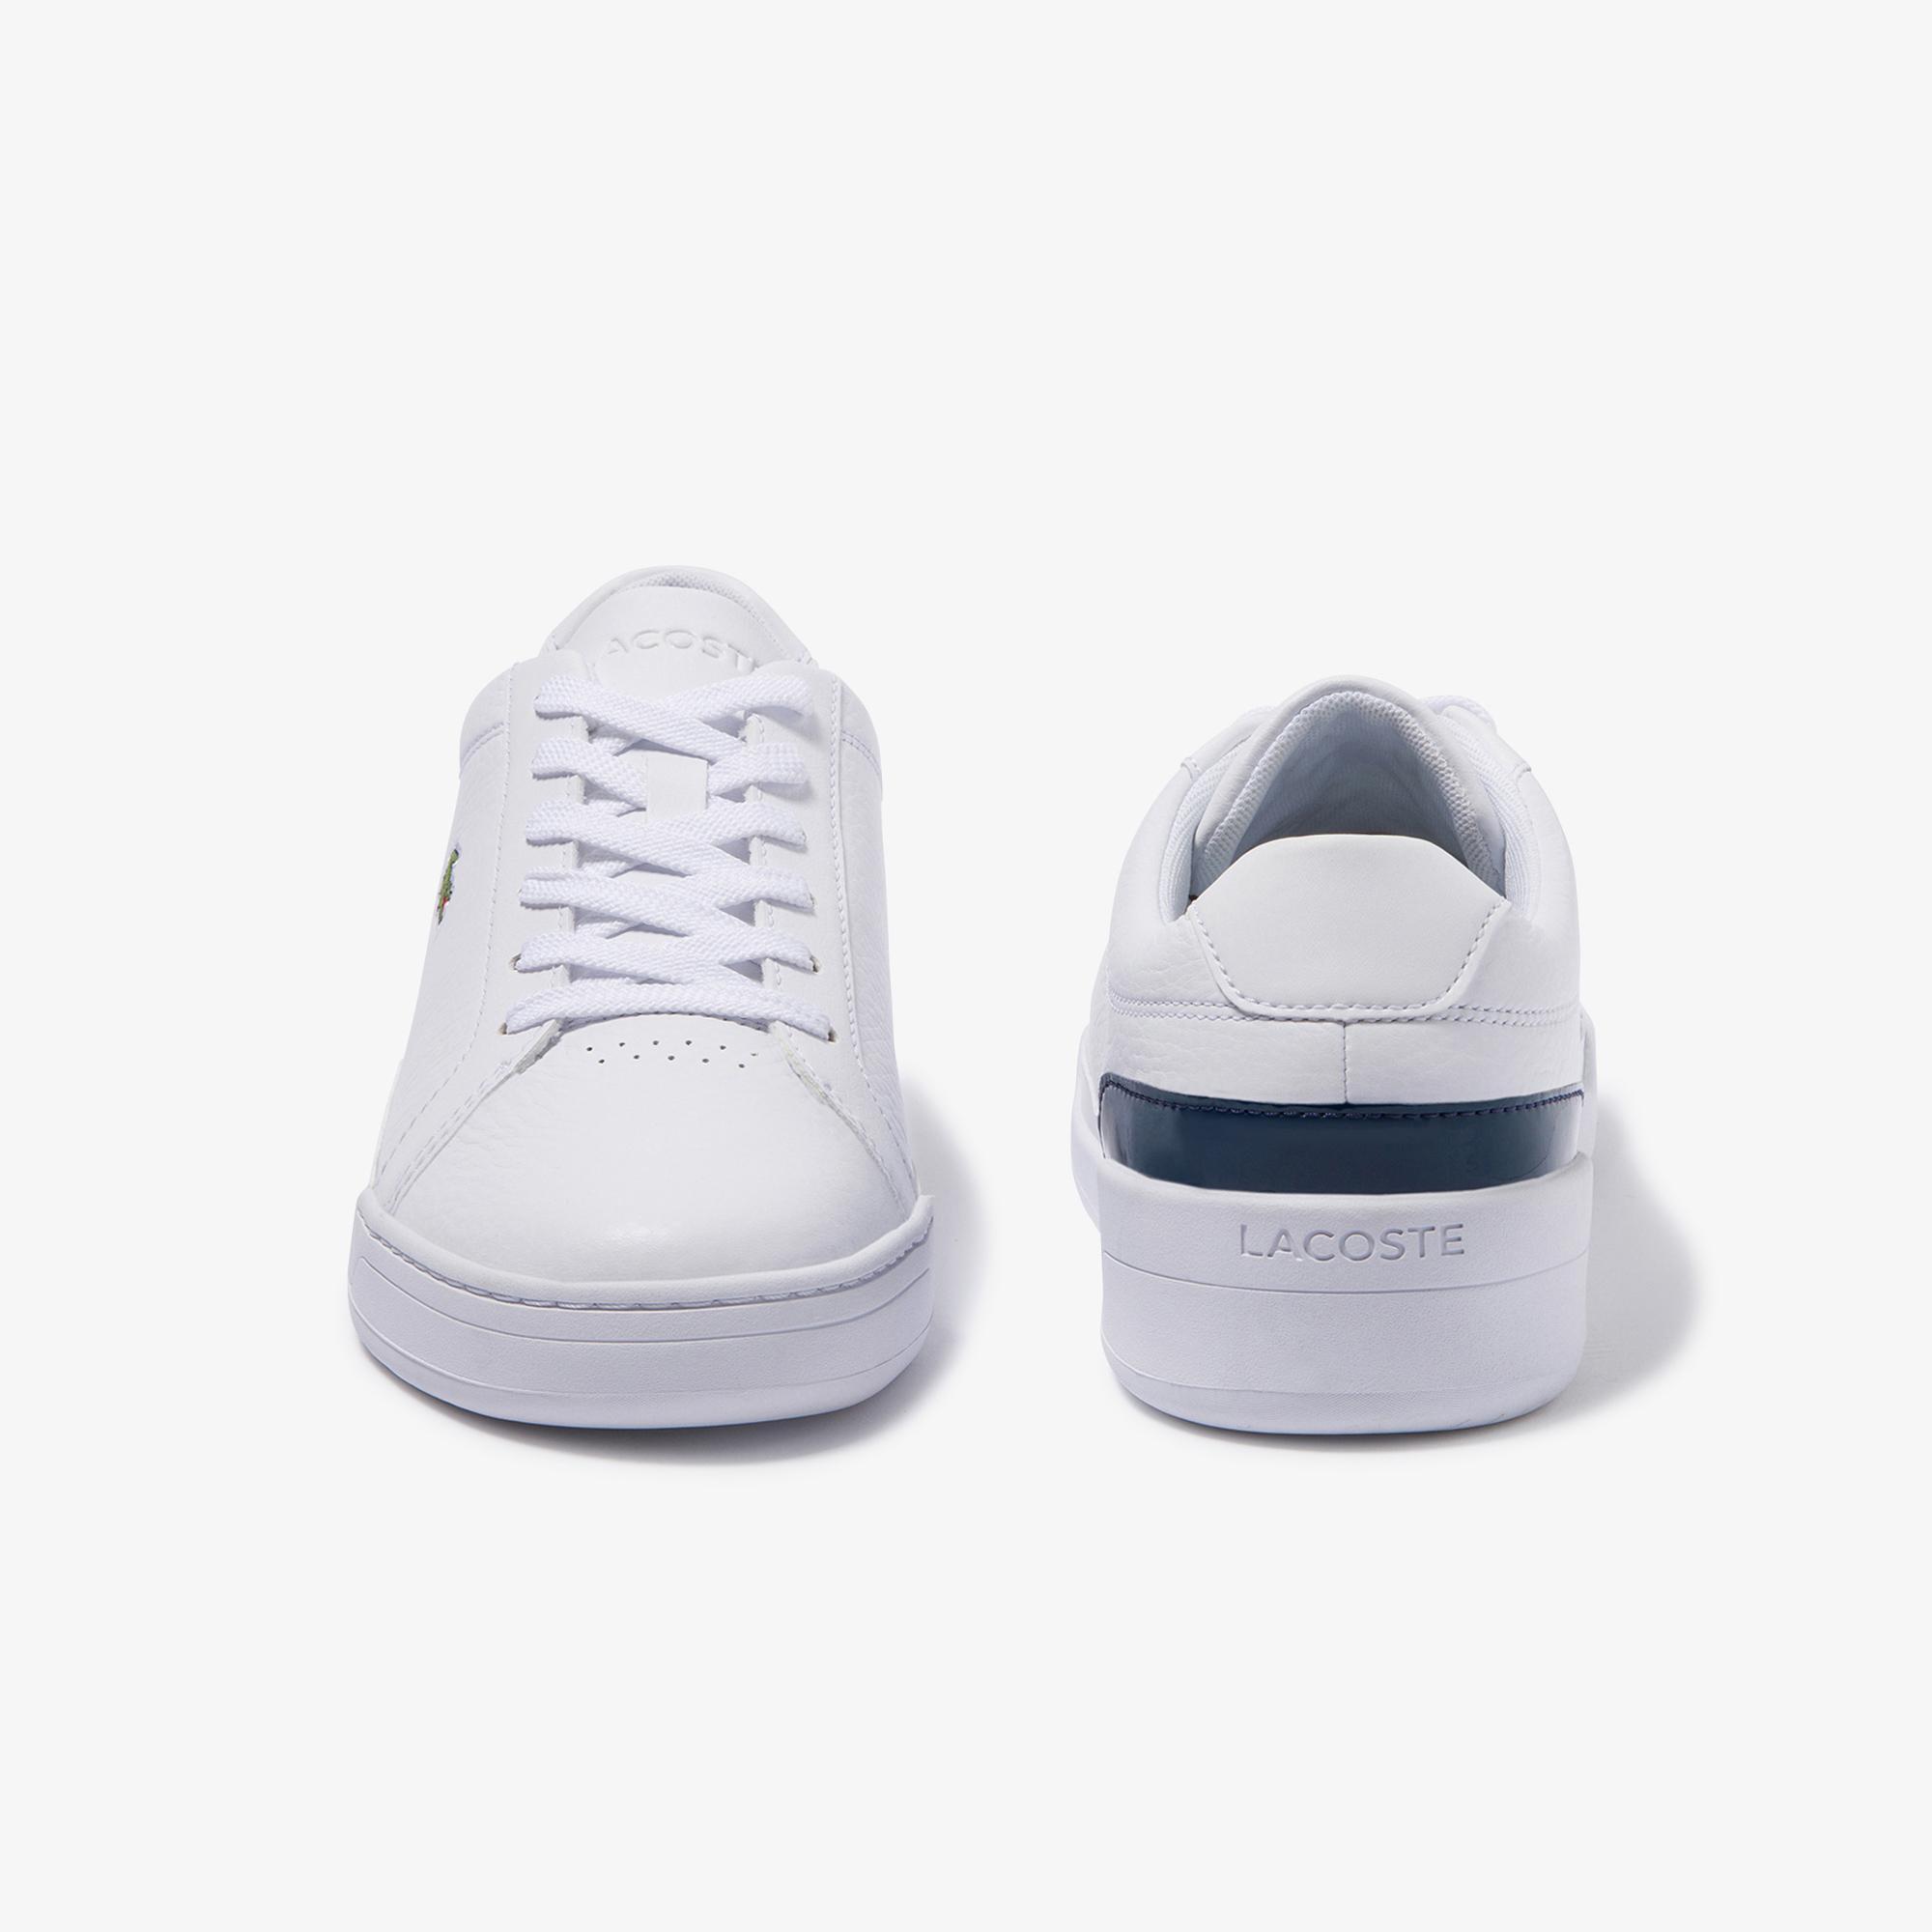 Lacoste Chalange 220 1 Men's Sneakers